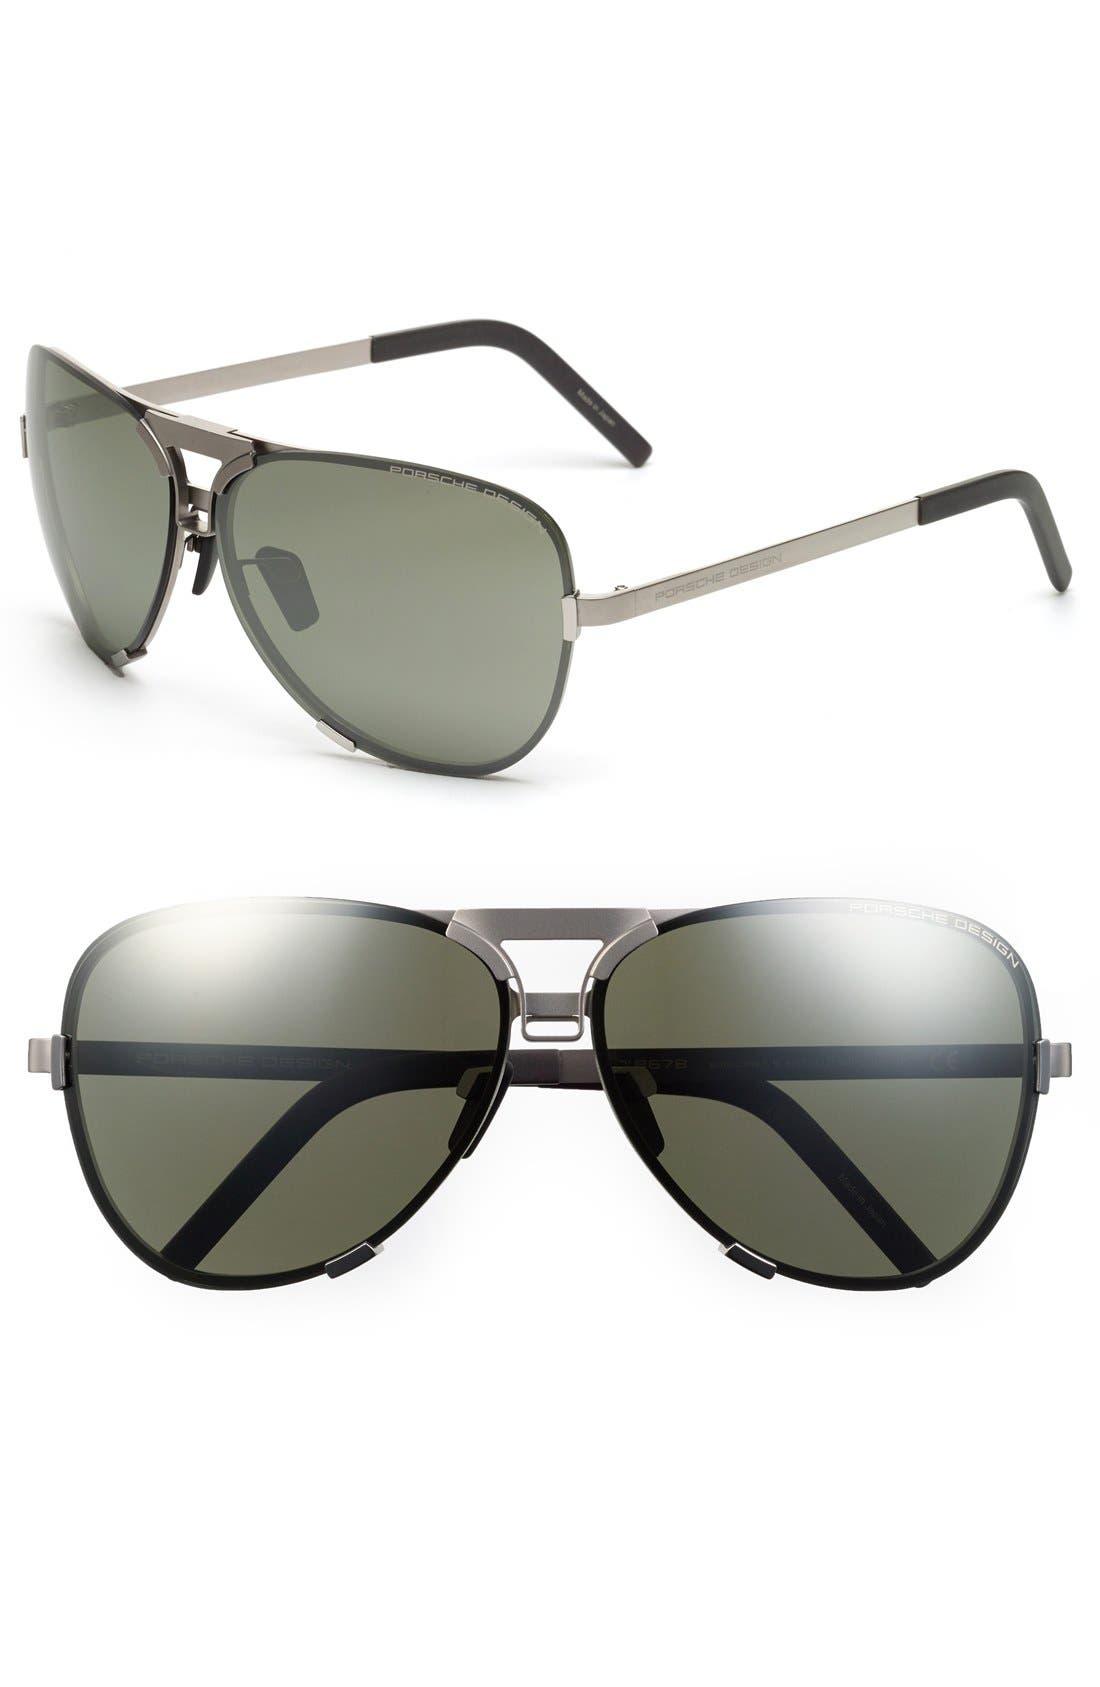 PORSCHE DESIGN P8678 67mm Sunglasses